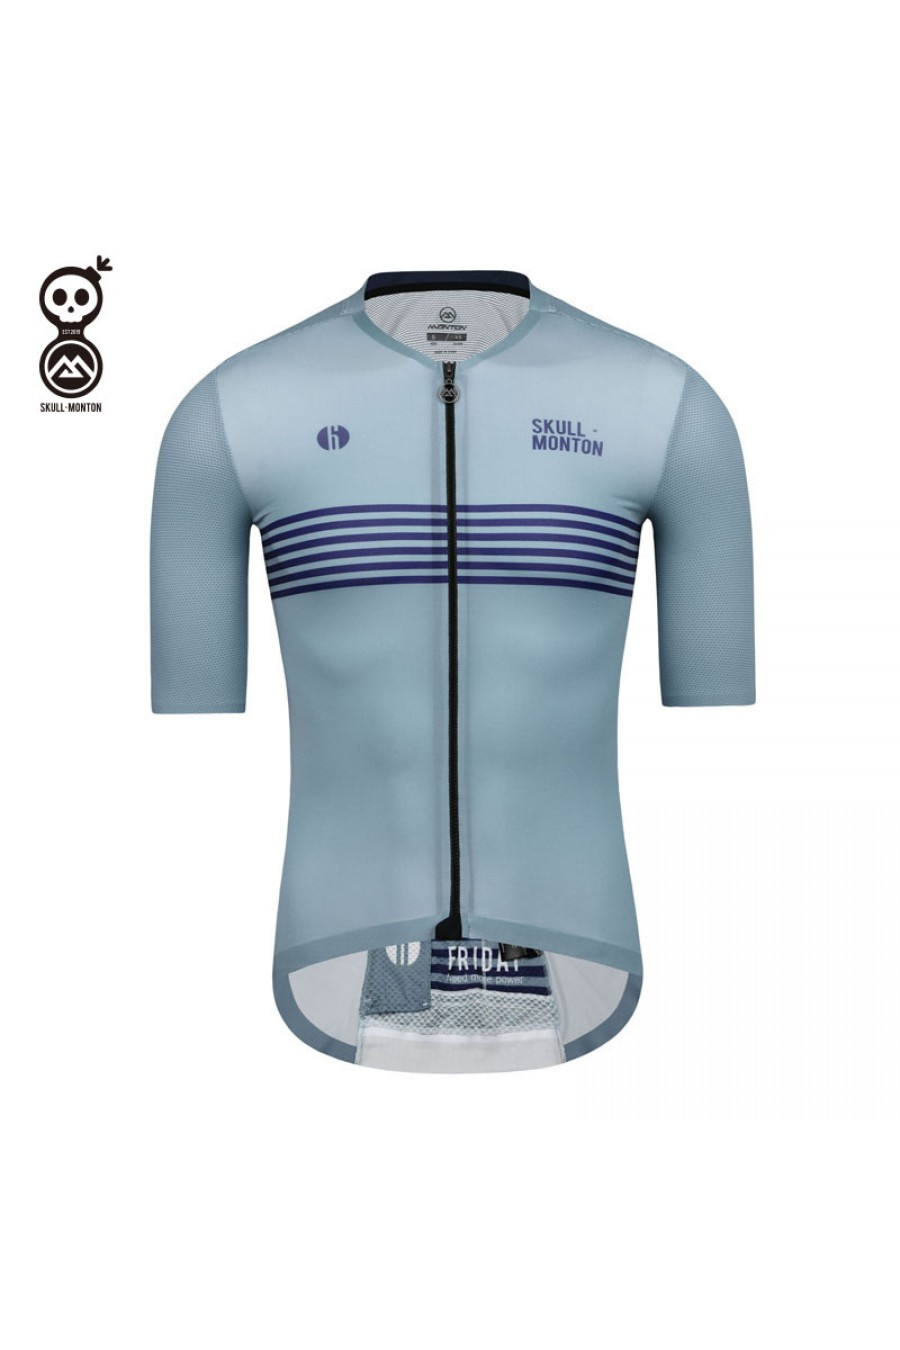 Bib Shorts Men/'s Cycling Kit Cycling Team Clothing Blue Stripes Jersey and